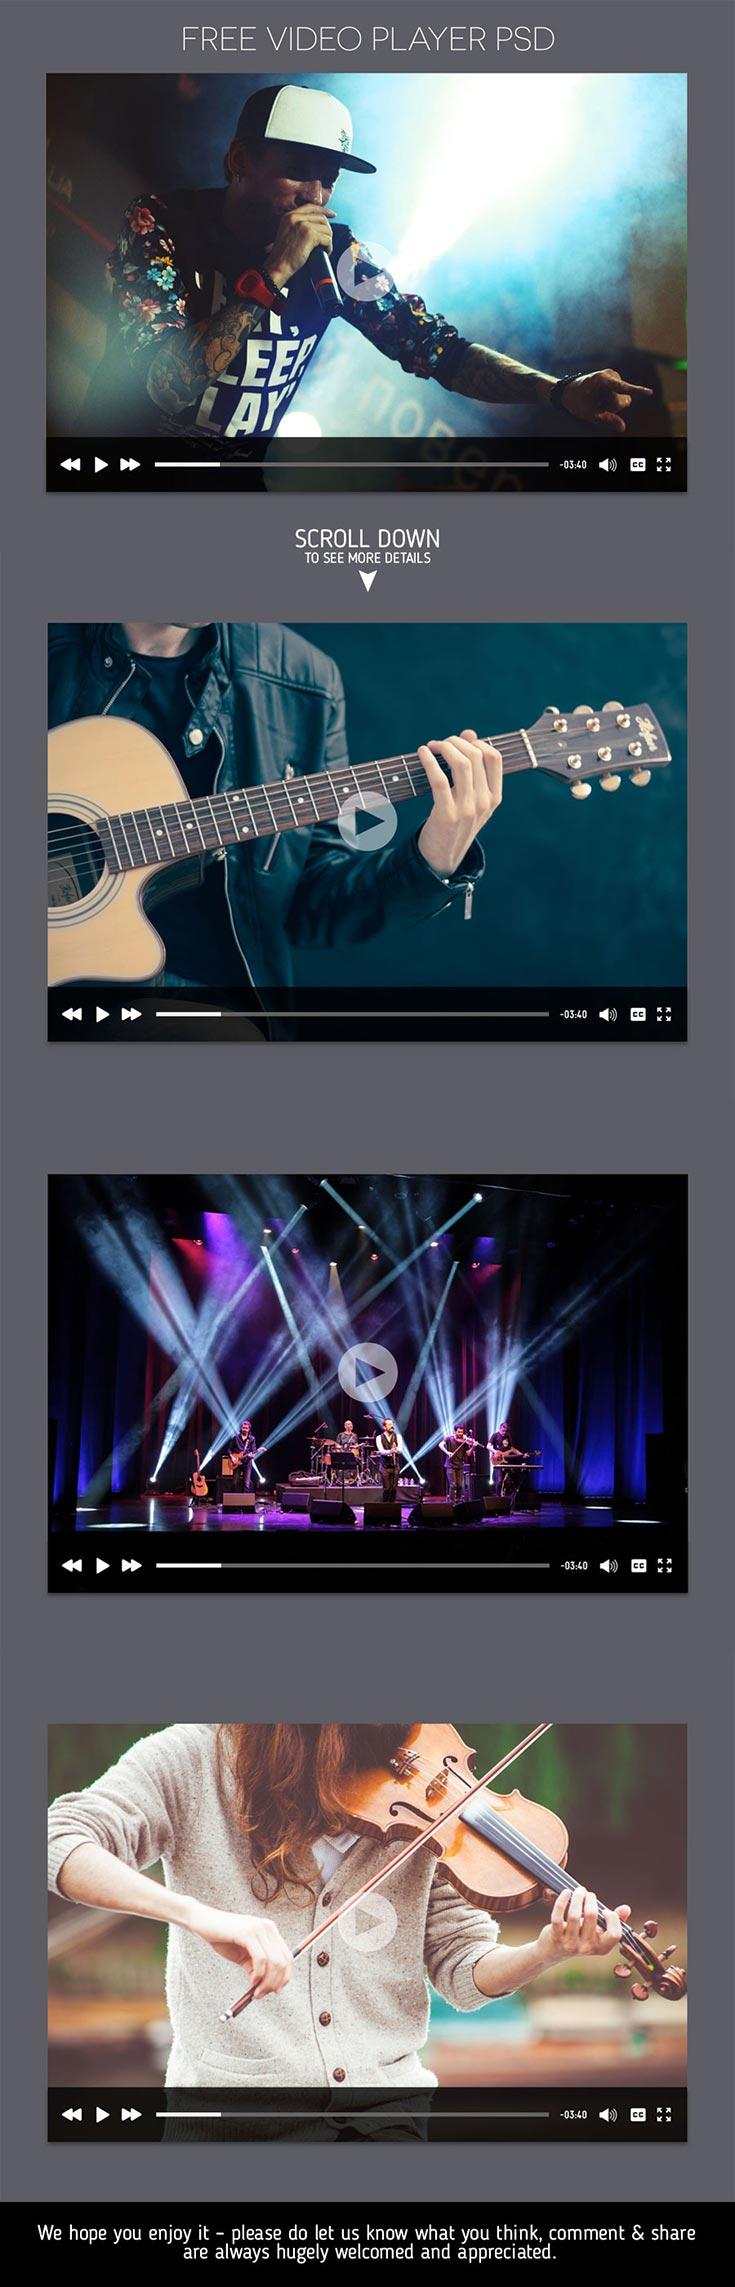 Youtube Player UI - Free PSD Template Mock up - Creativetacos